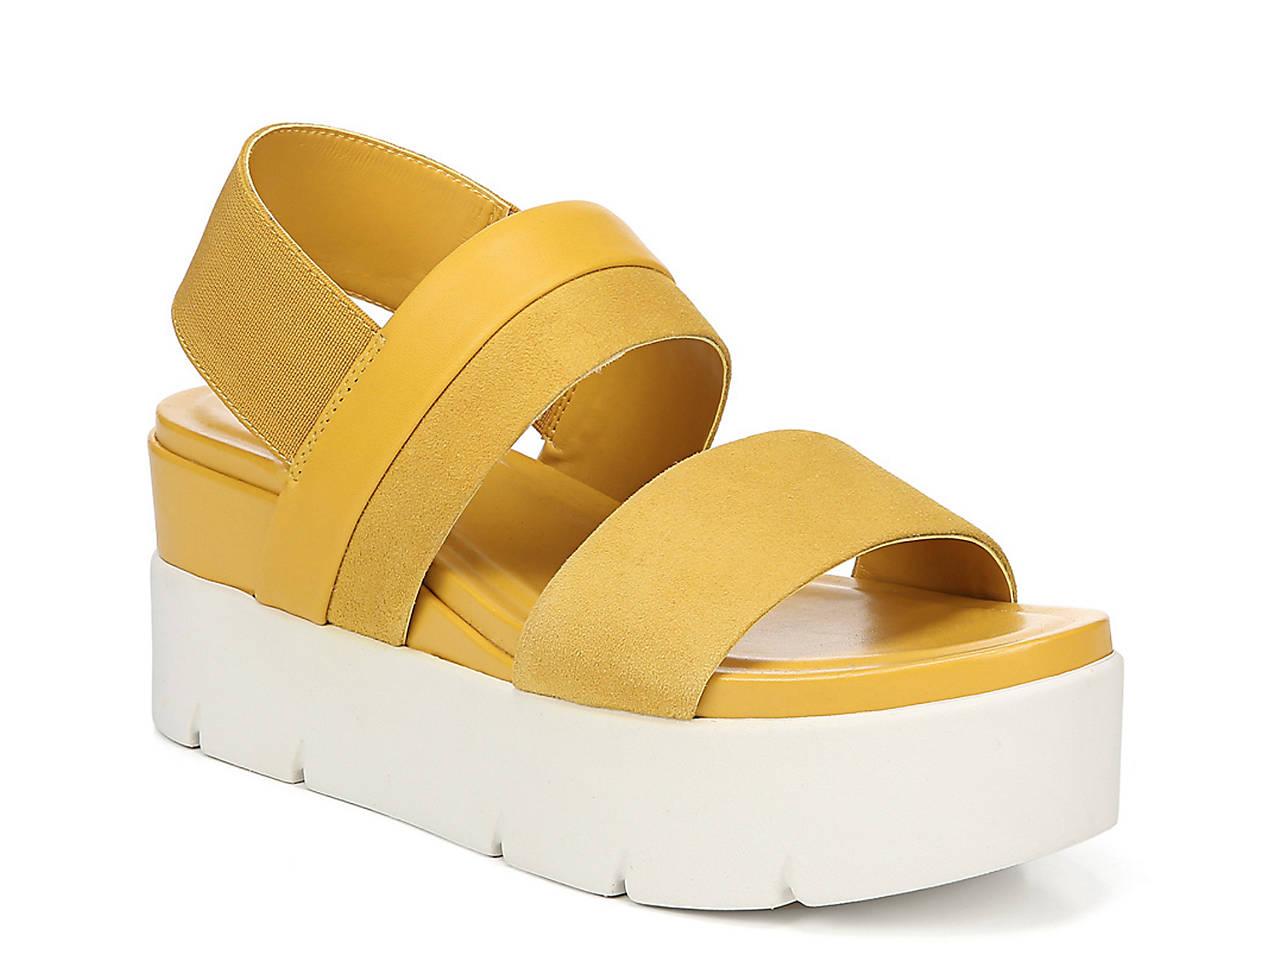 059c5360f Franco Sarto Velma Wedge Sandal Women's Shoes | DSW